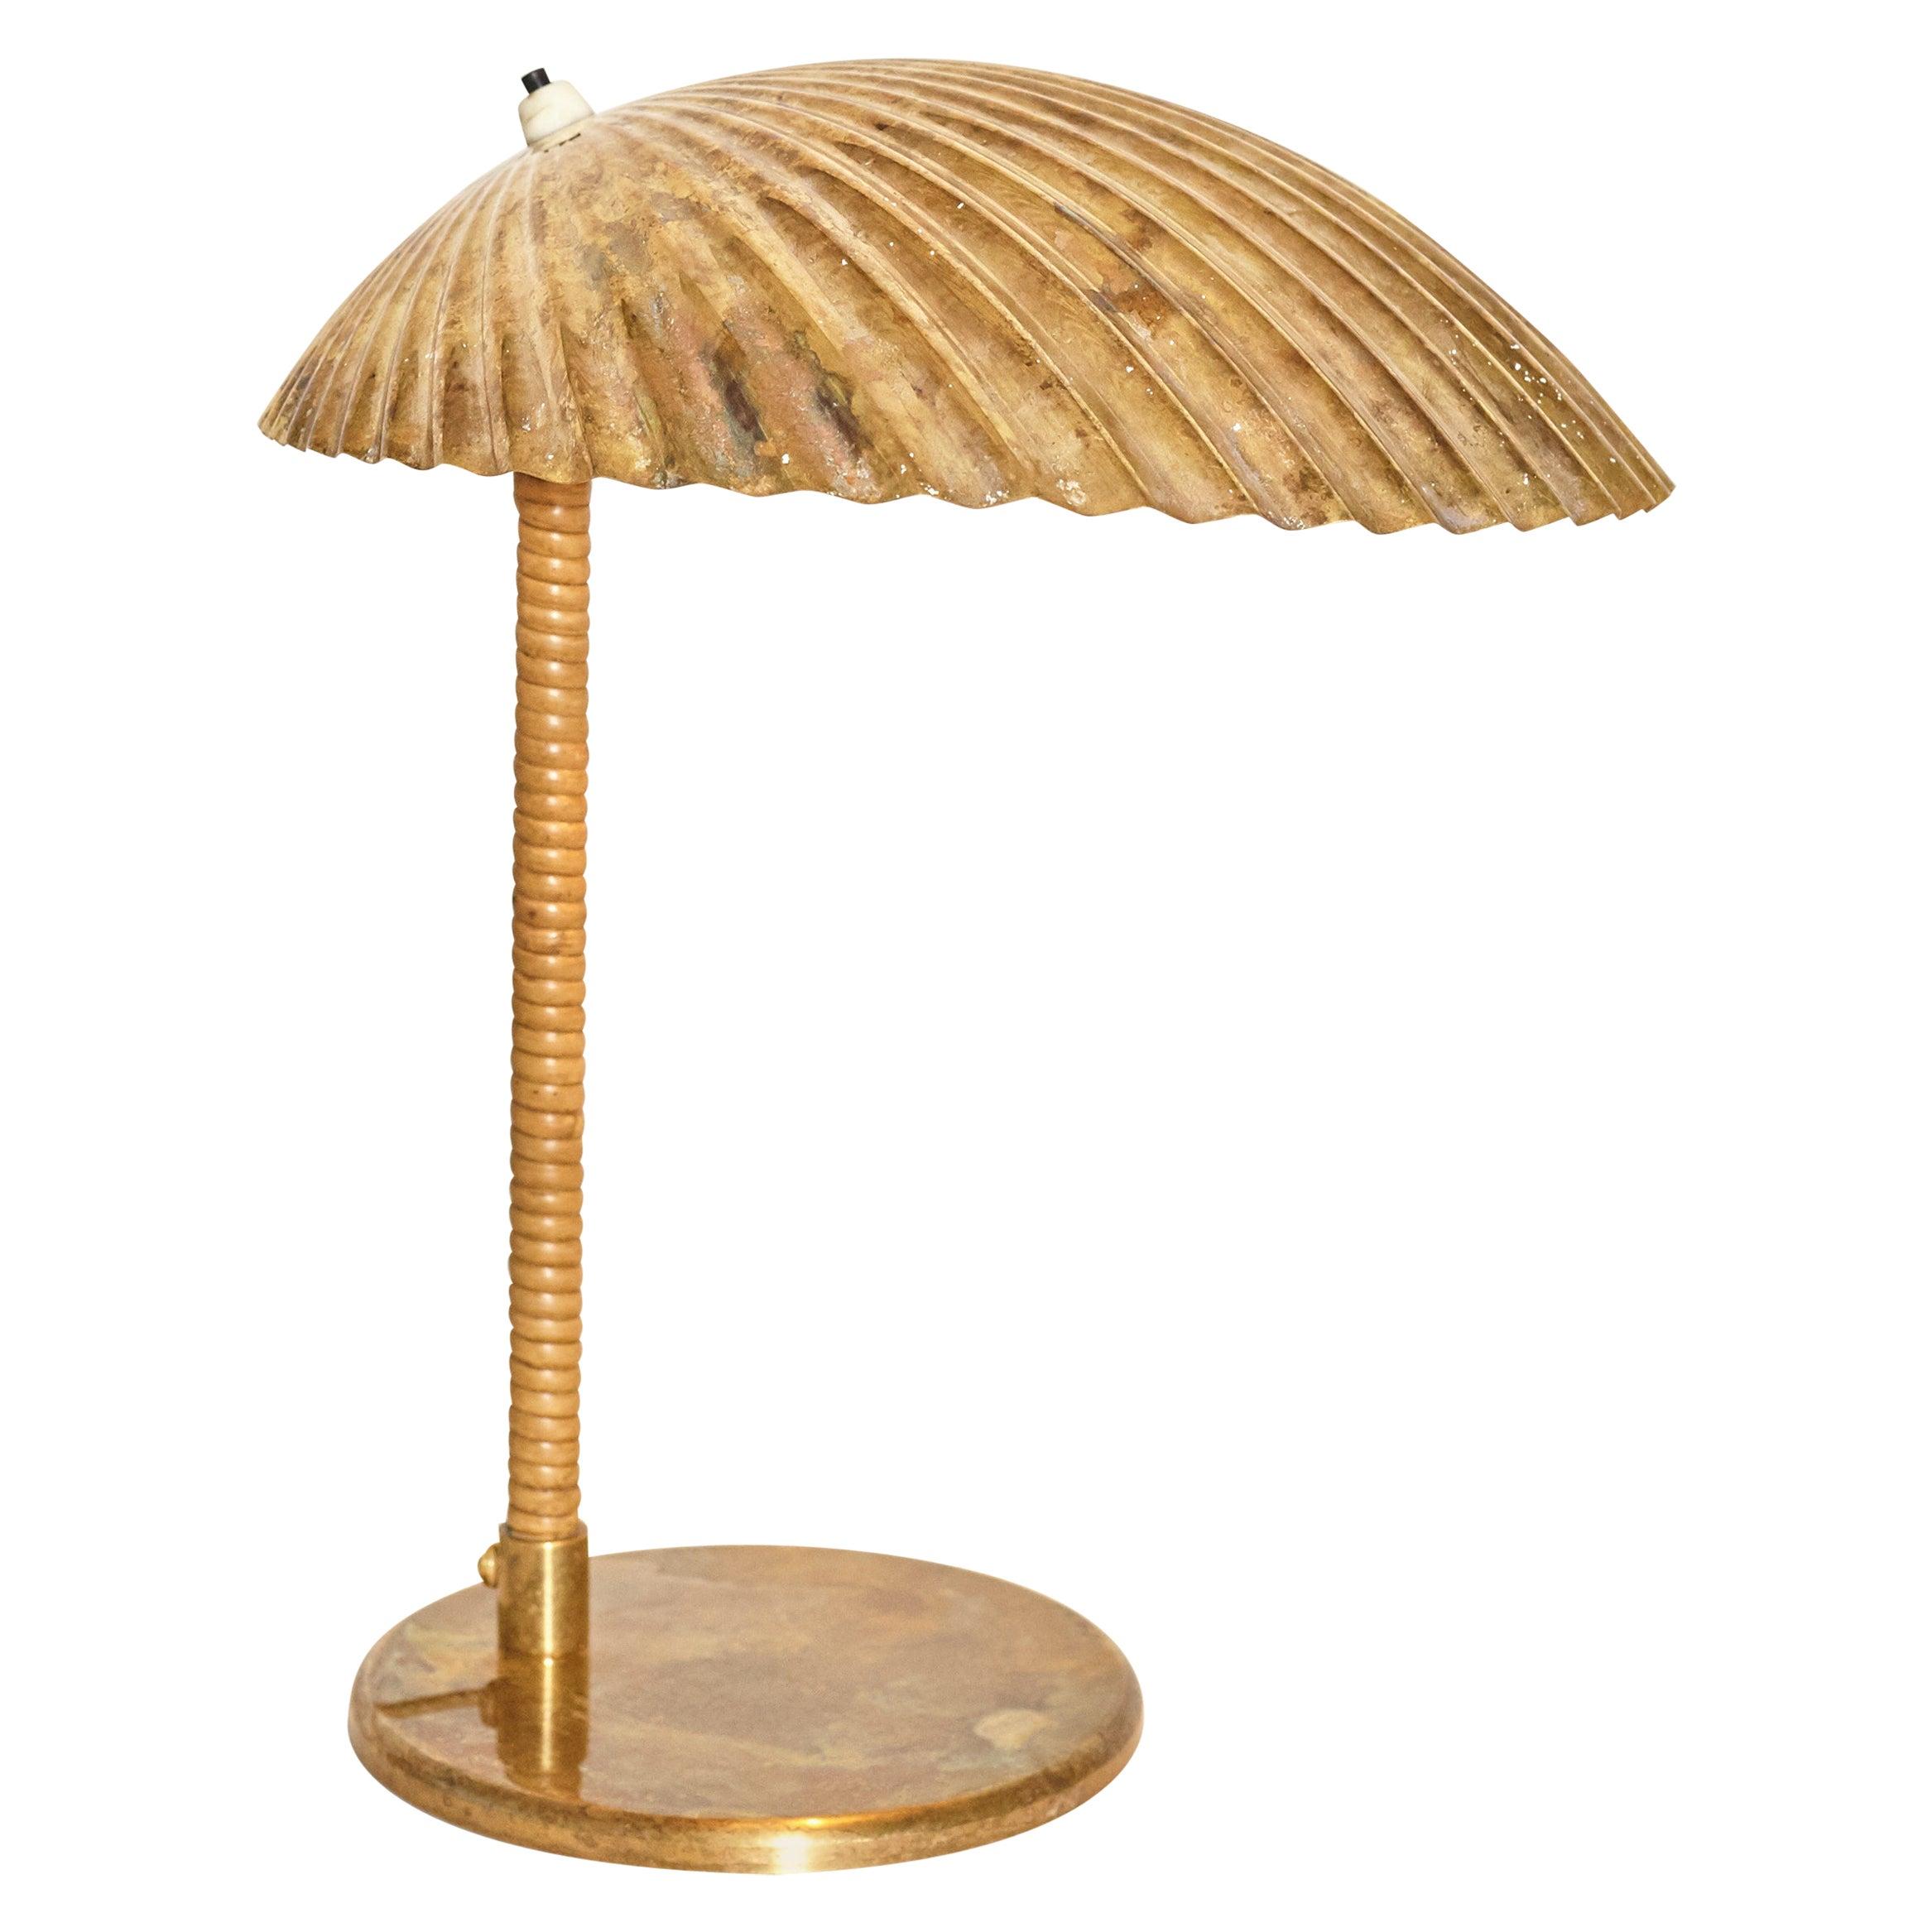 Paavo Tynell Simpukka 'Clam' Table / Desk Lamp, Taito Oy, Finland, 1930s-1940s